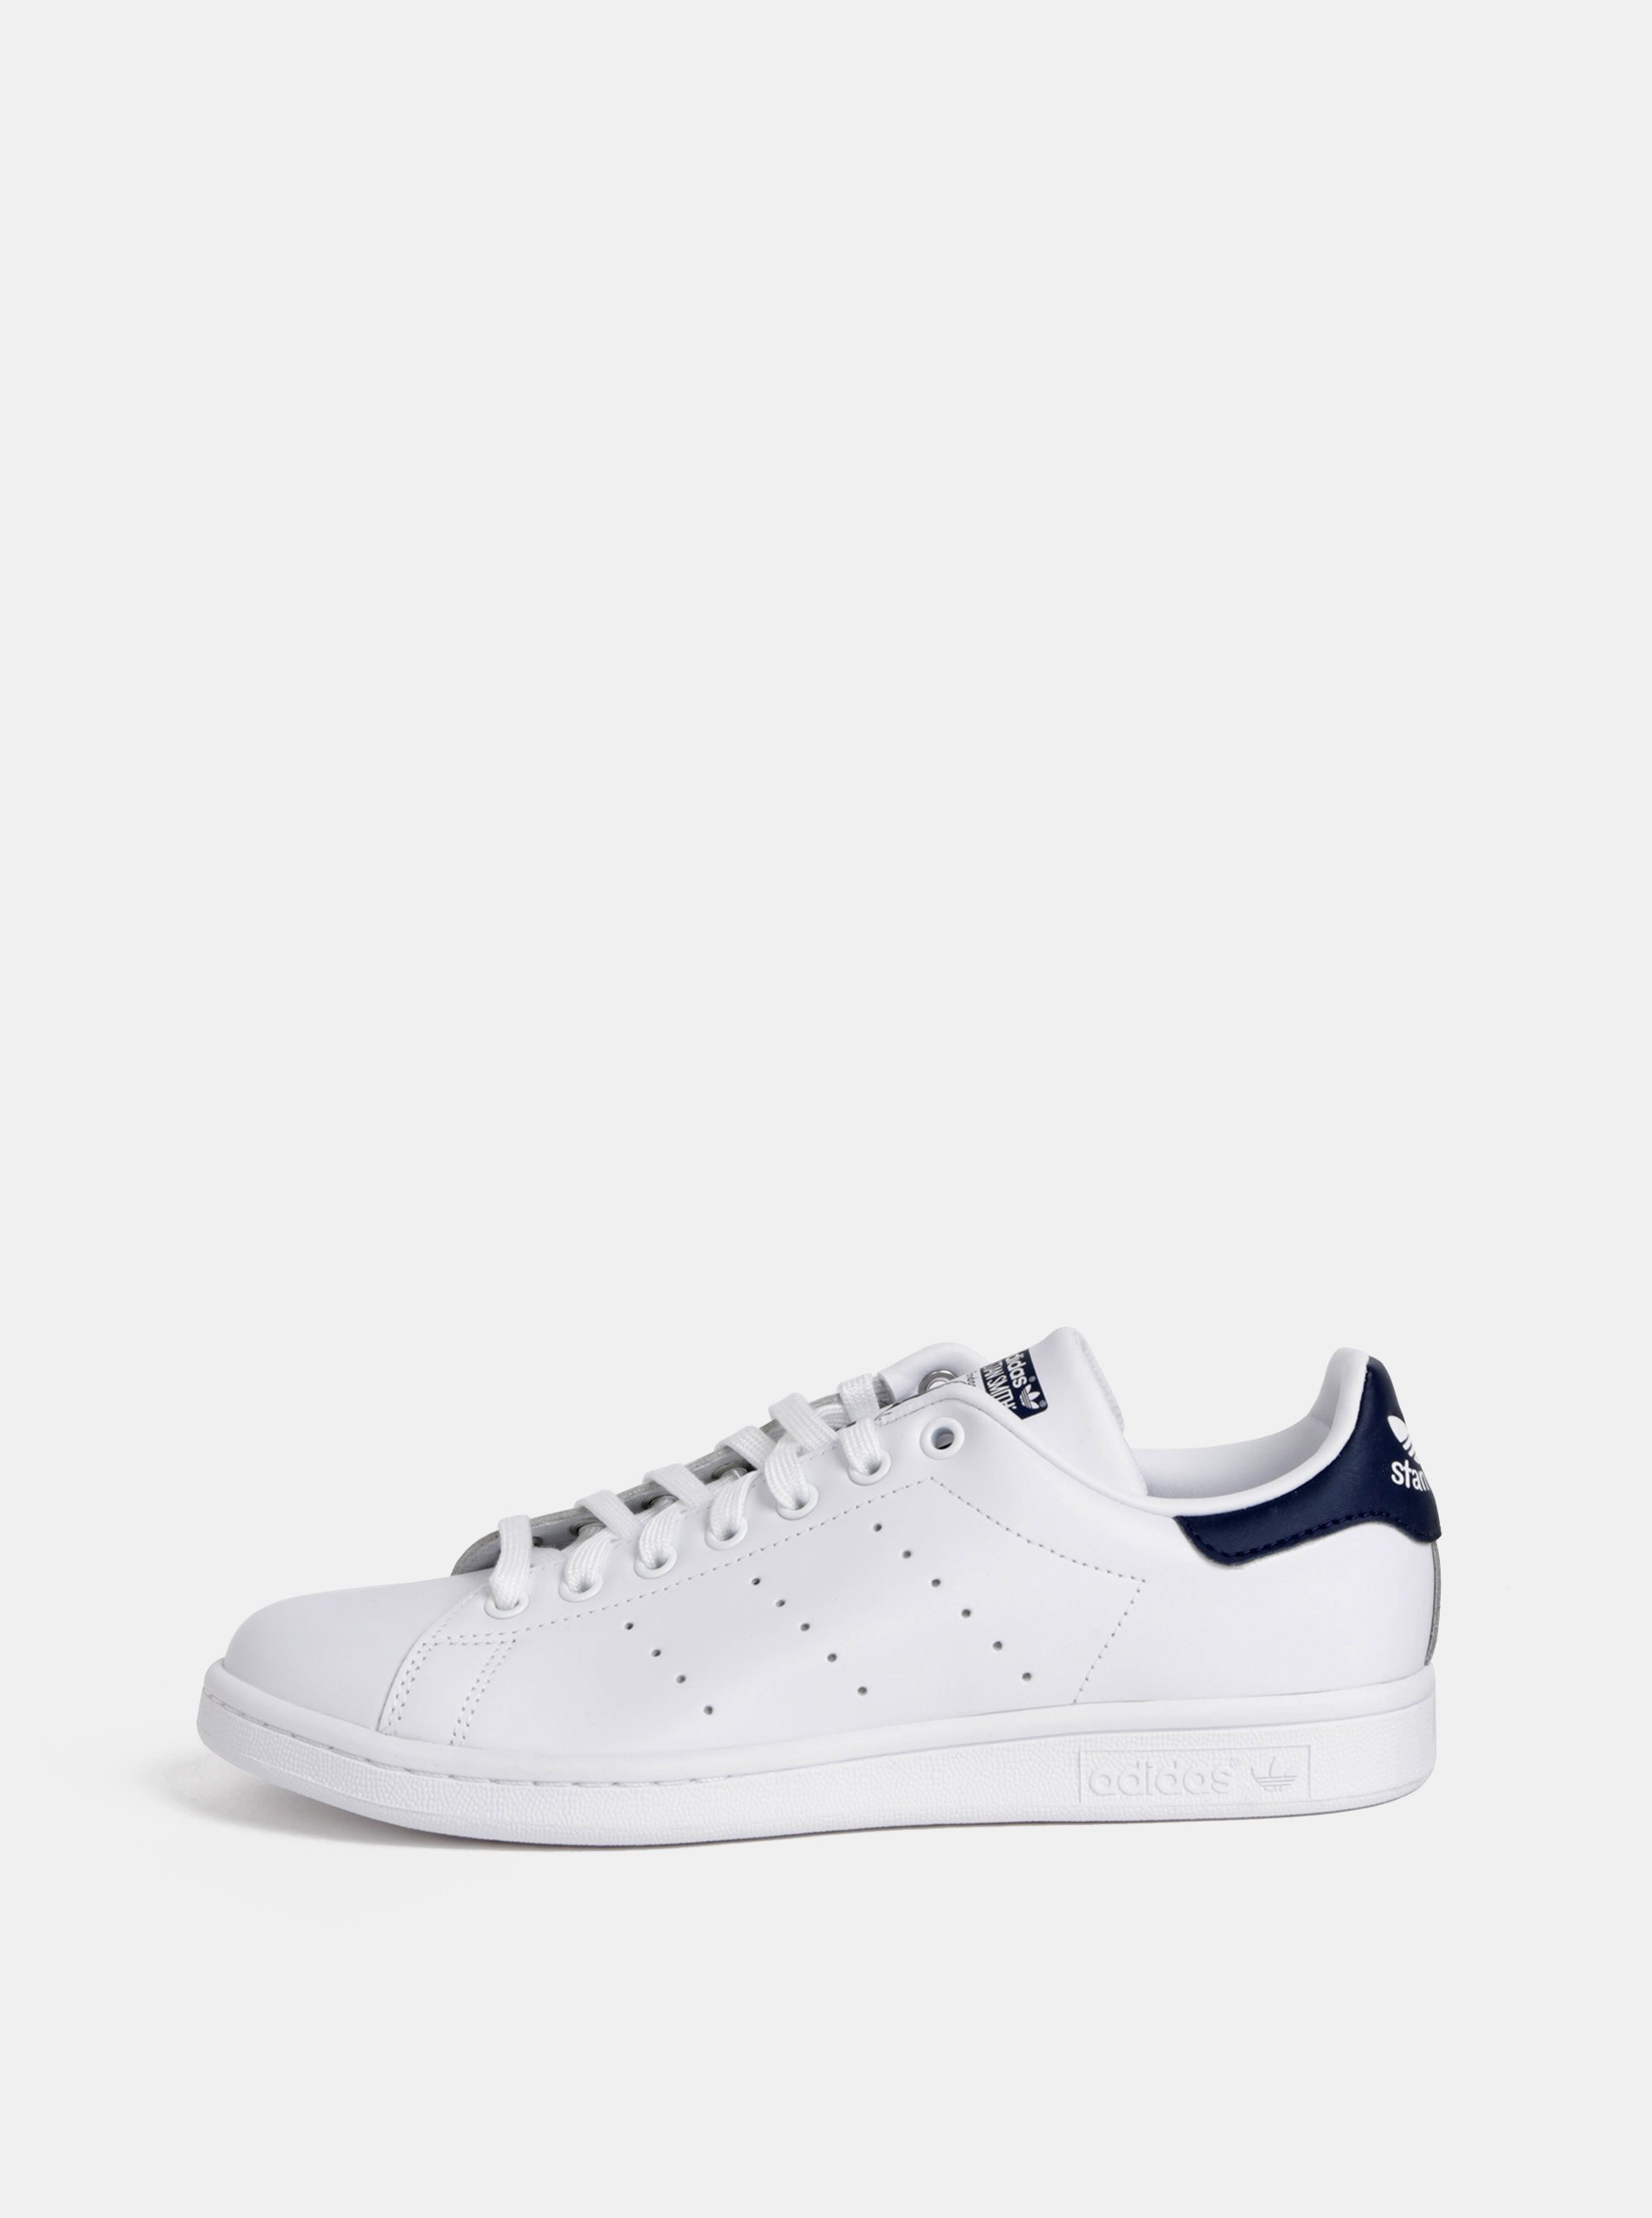 4ef114e8b8 Bílé pánské kožené tenisky adidas Originals Stan Smith